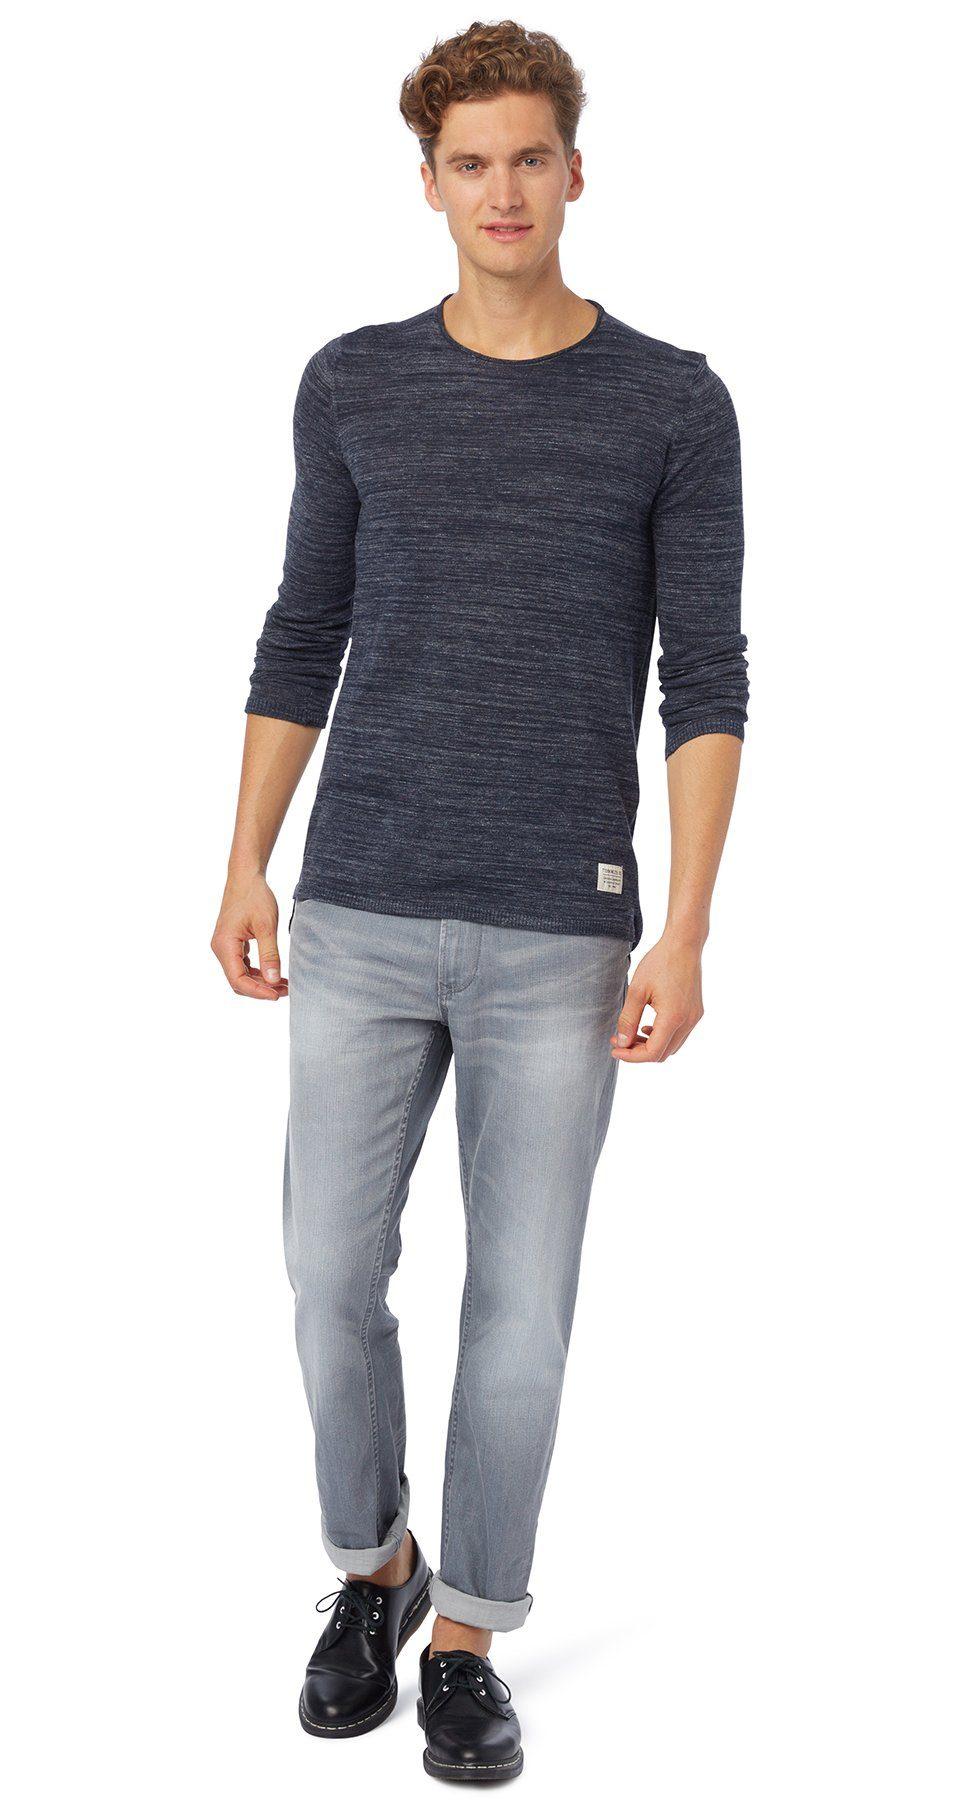 TOM TAILOR DENIM Jeans »Jeans mit Waschung«